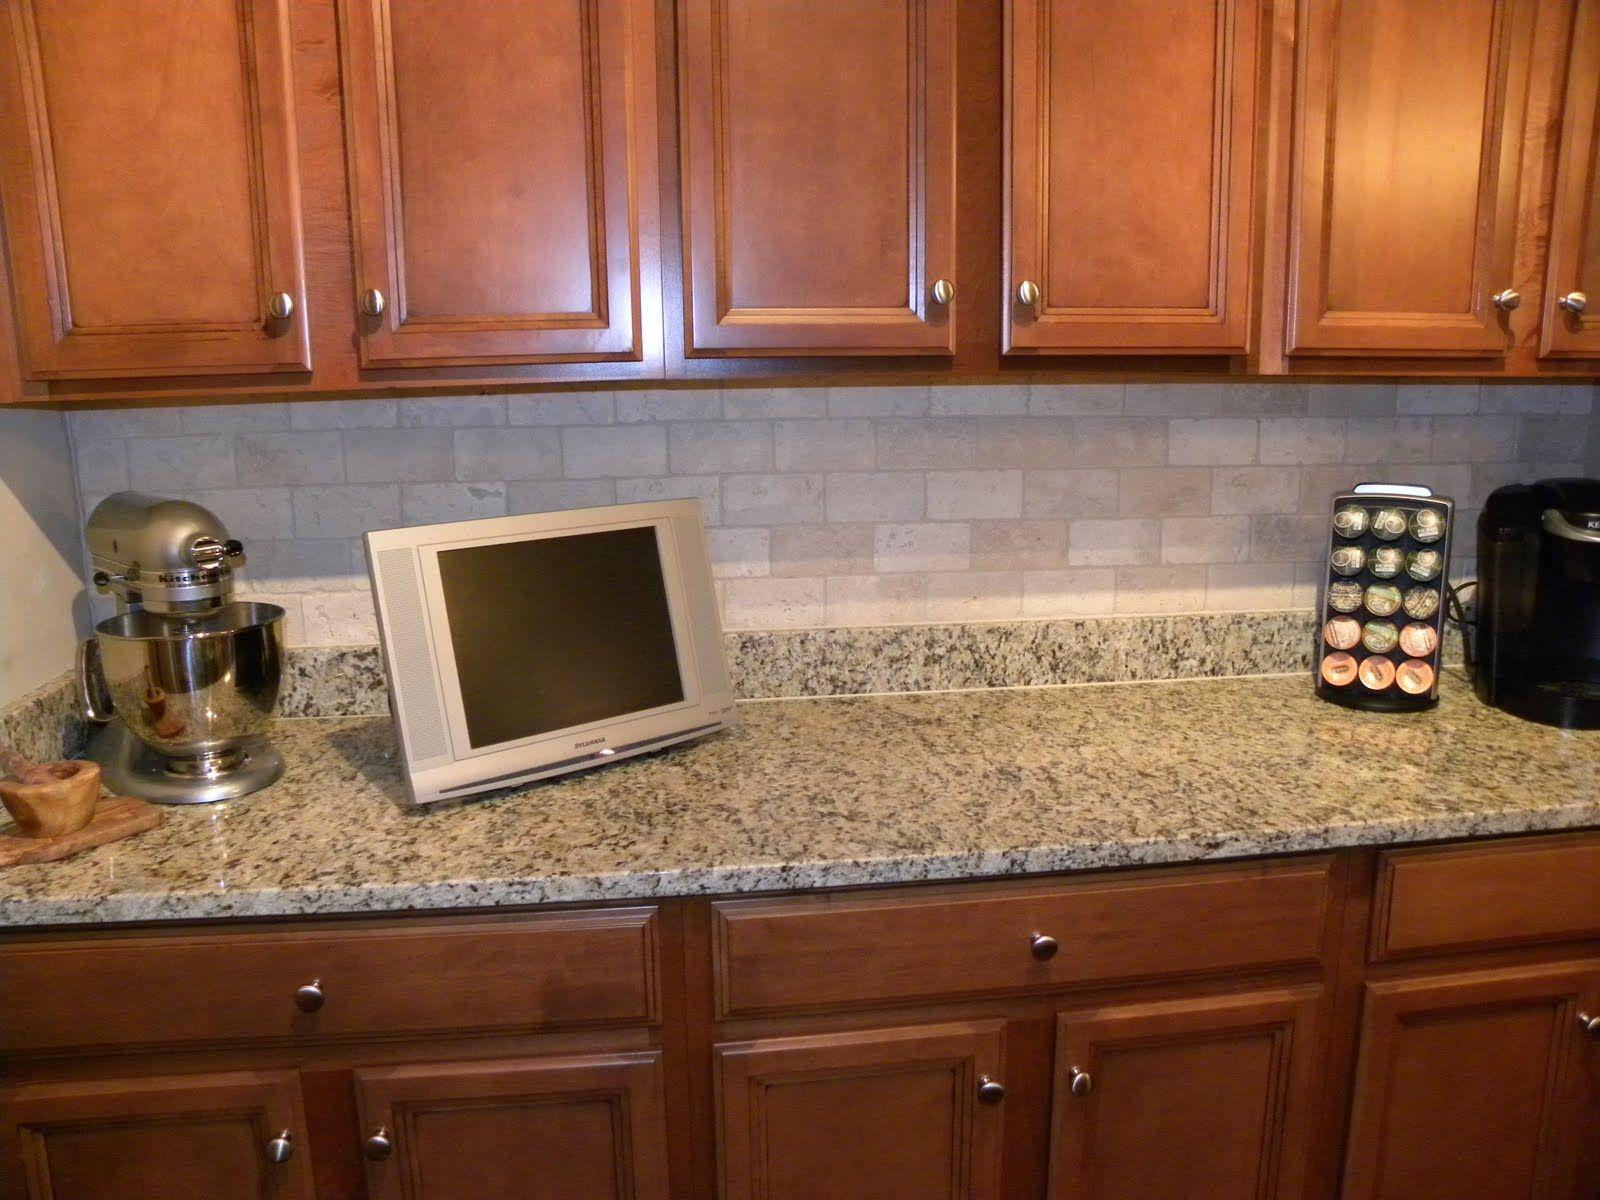 Ideas kitchen best diy backsplash cabinets kitchens backsplashes pictures kaffiyadecoration